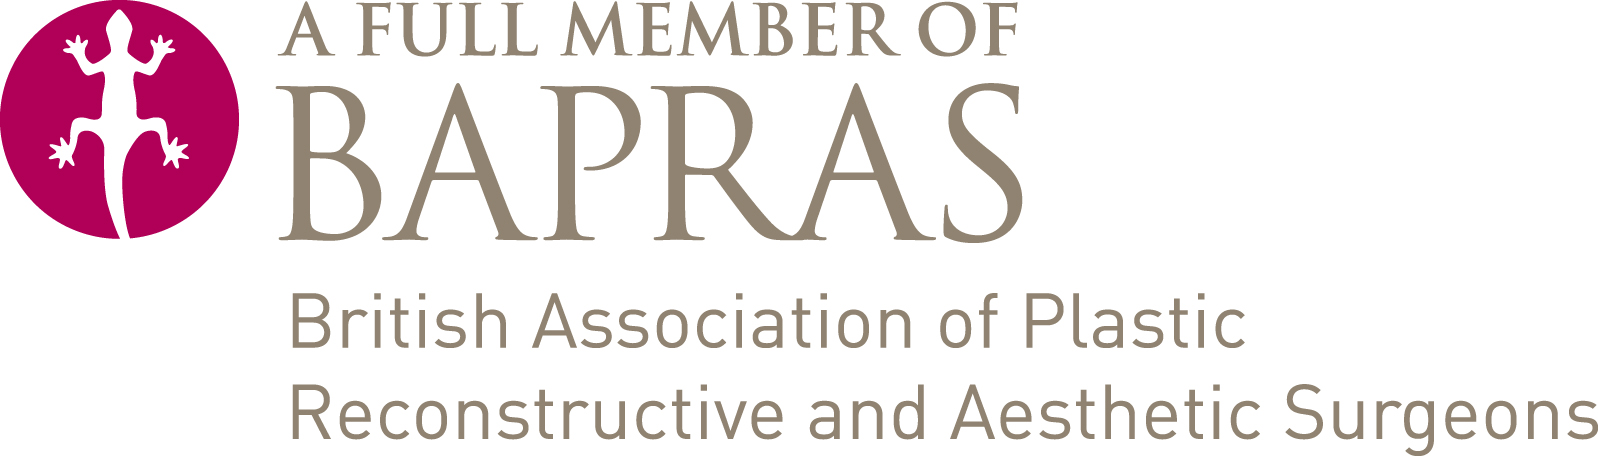 bapras british association of plastic reconstructive and aesthetic surgeons member 1